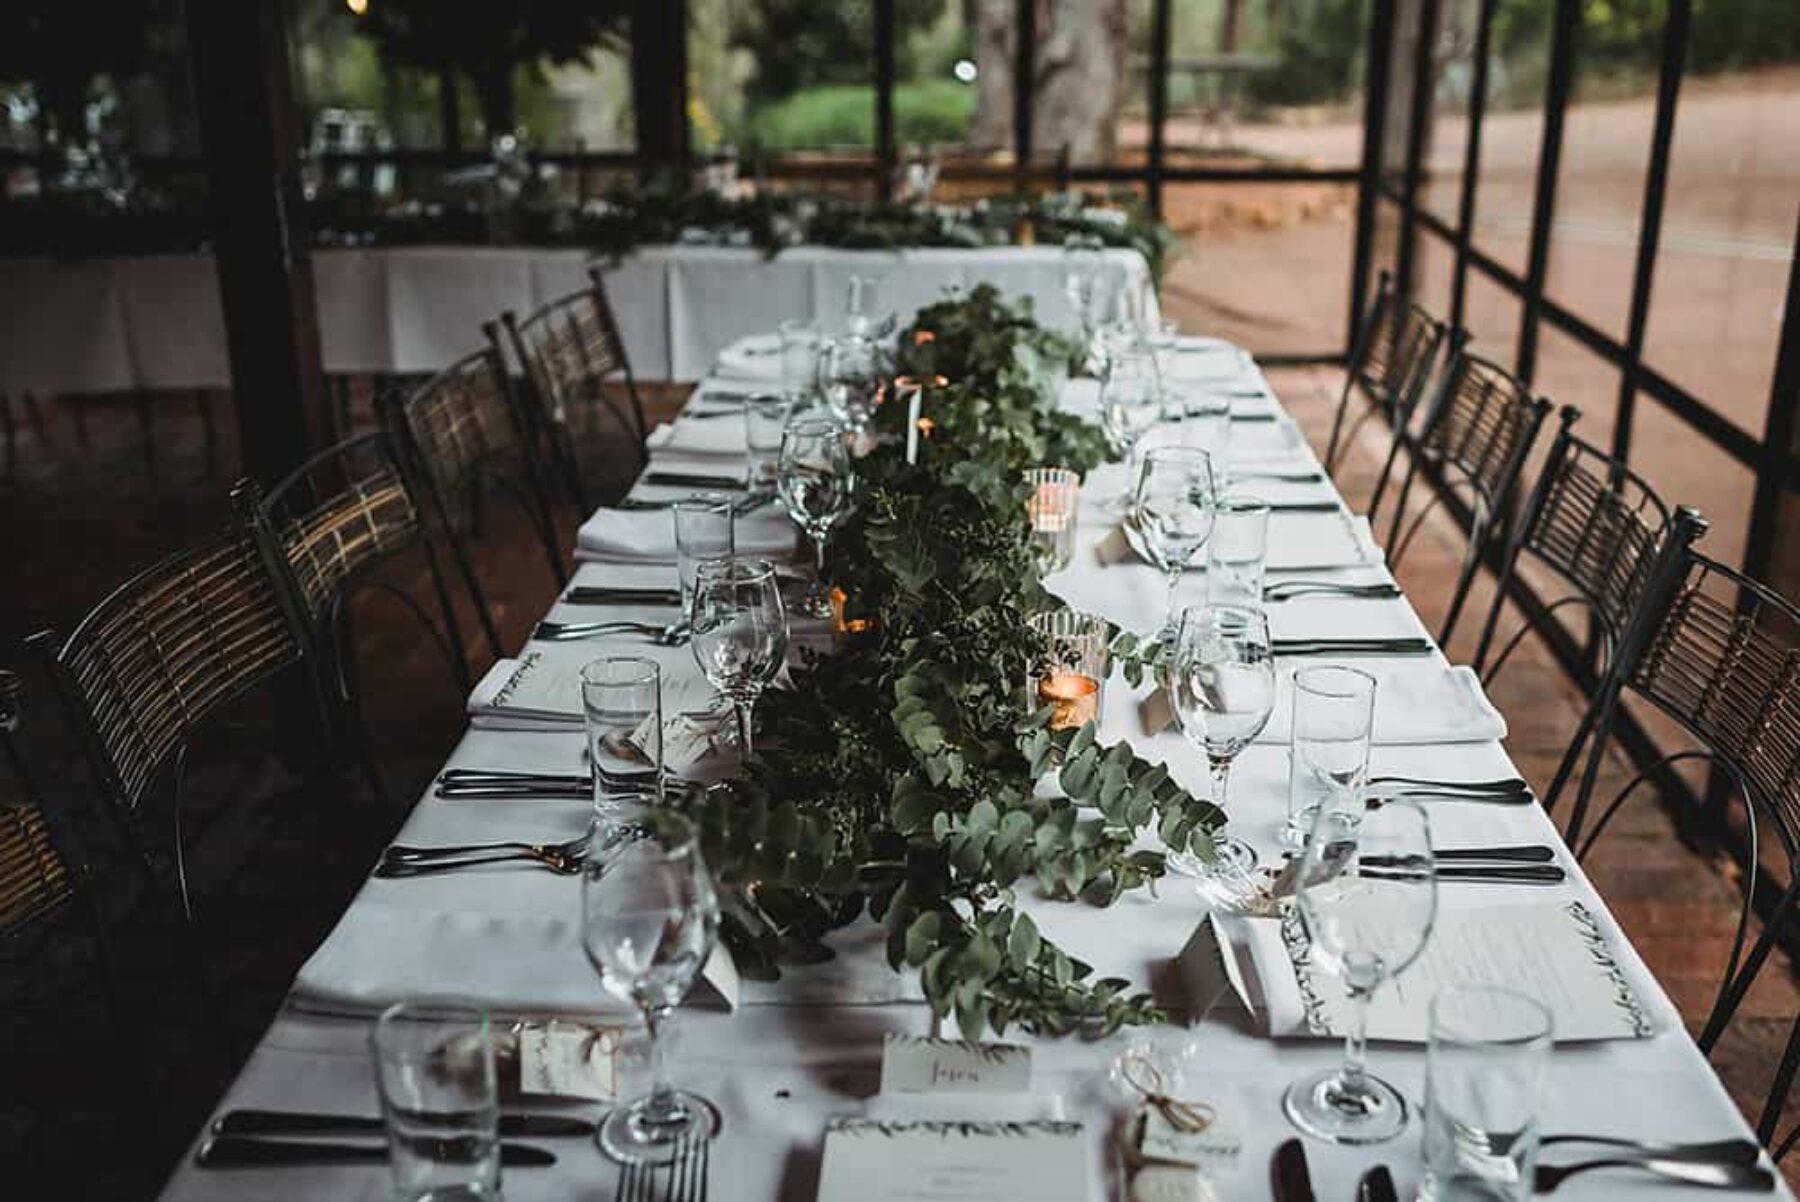 Darlington Estate wedding - Perth photographer CJ WIliams